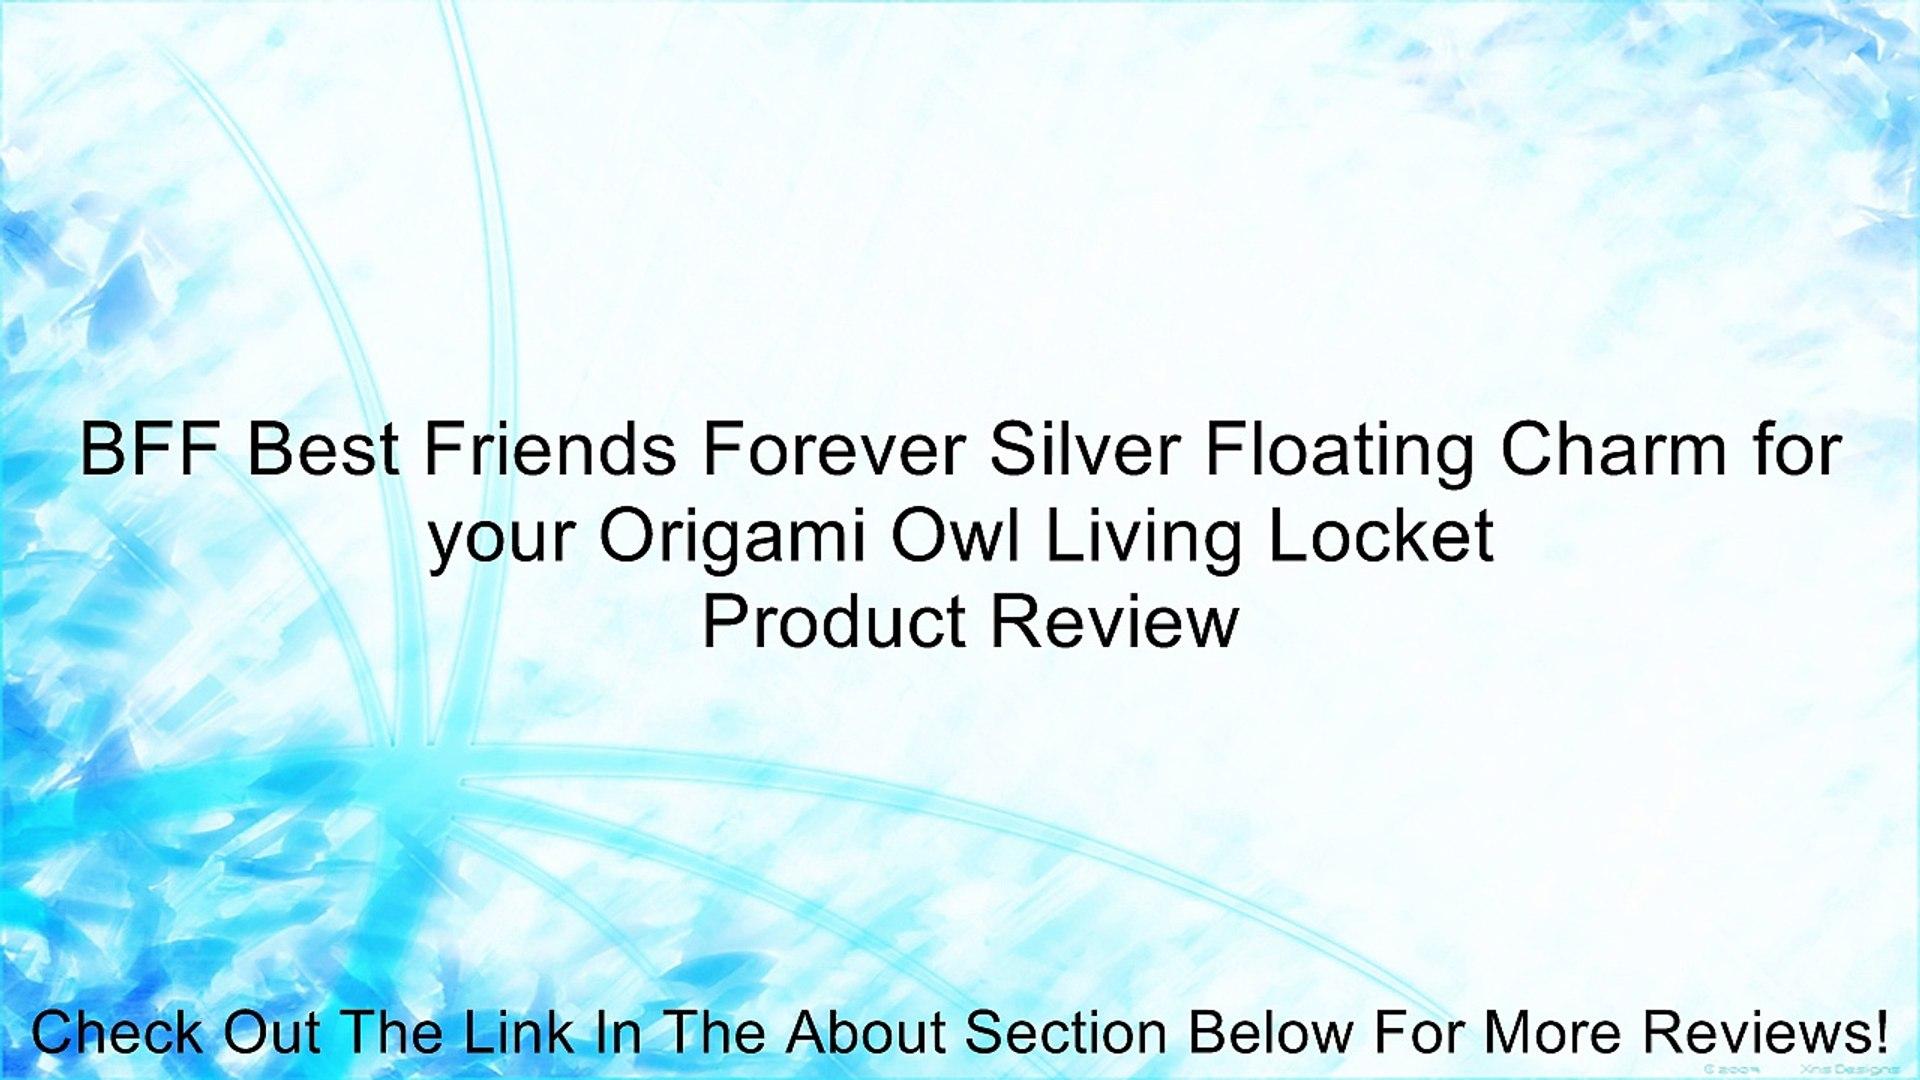 25mm Twist Gold Waterproof Locket! Stainless Steel Floating ...   1080x1920